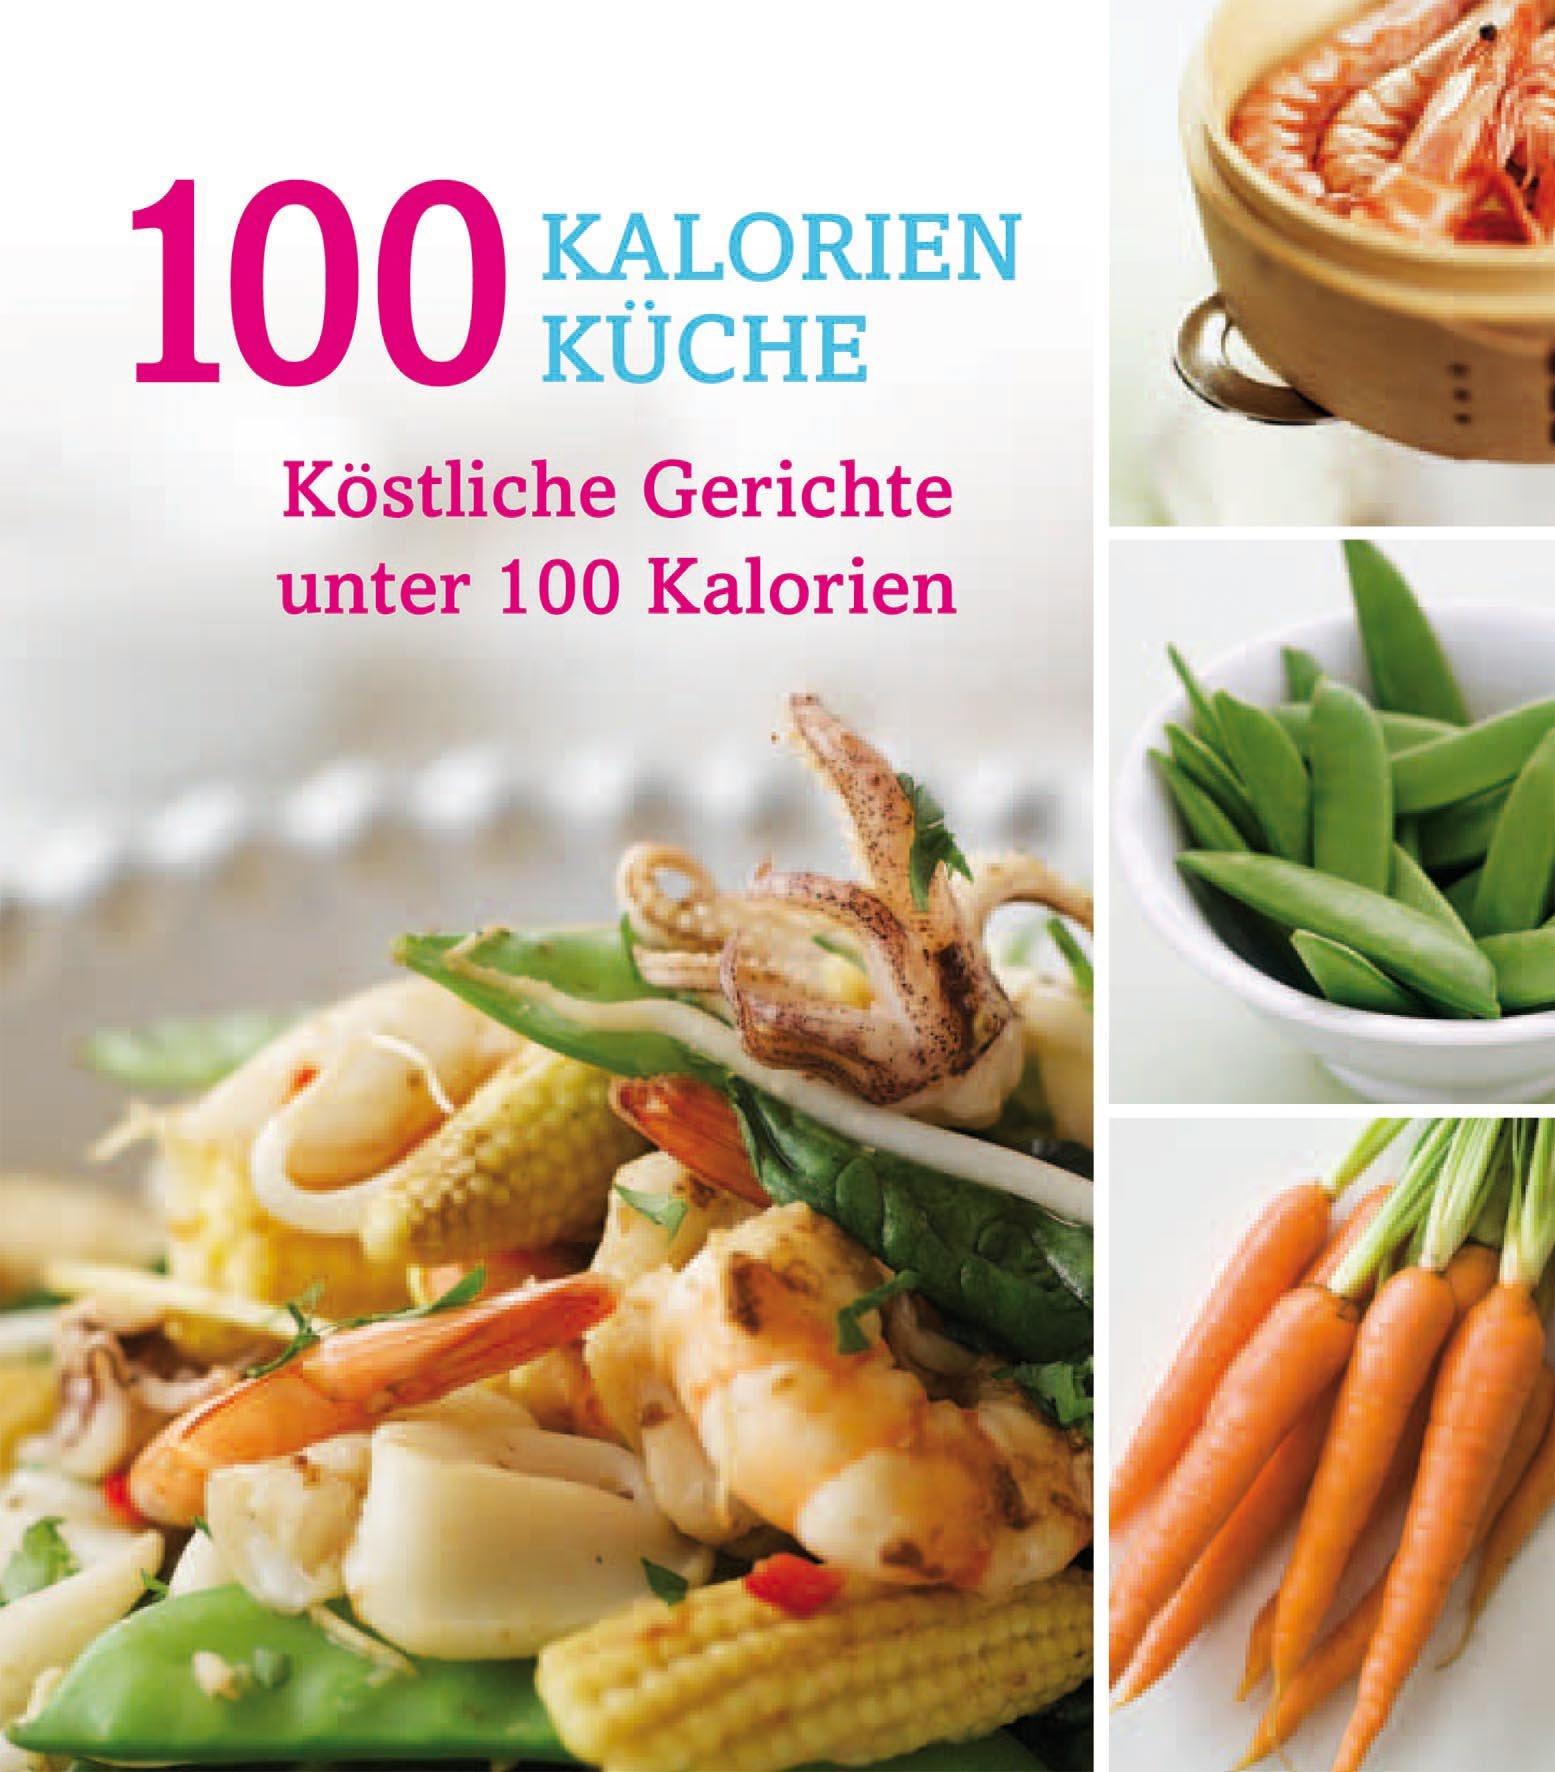 Kuchen unter 100 kalorien